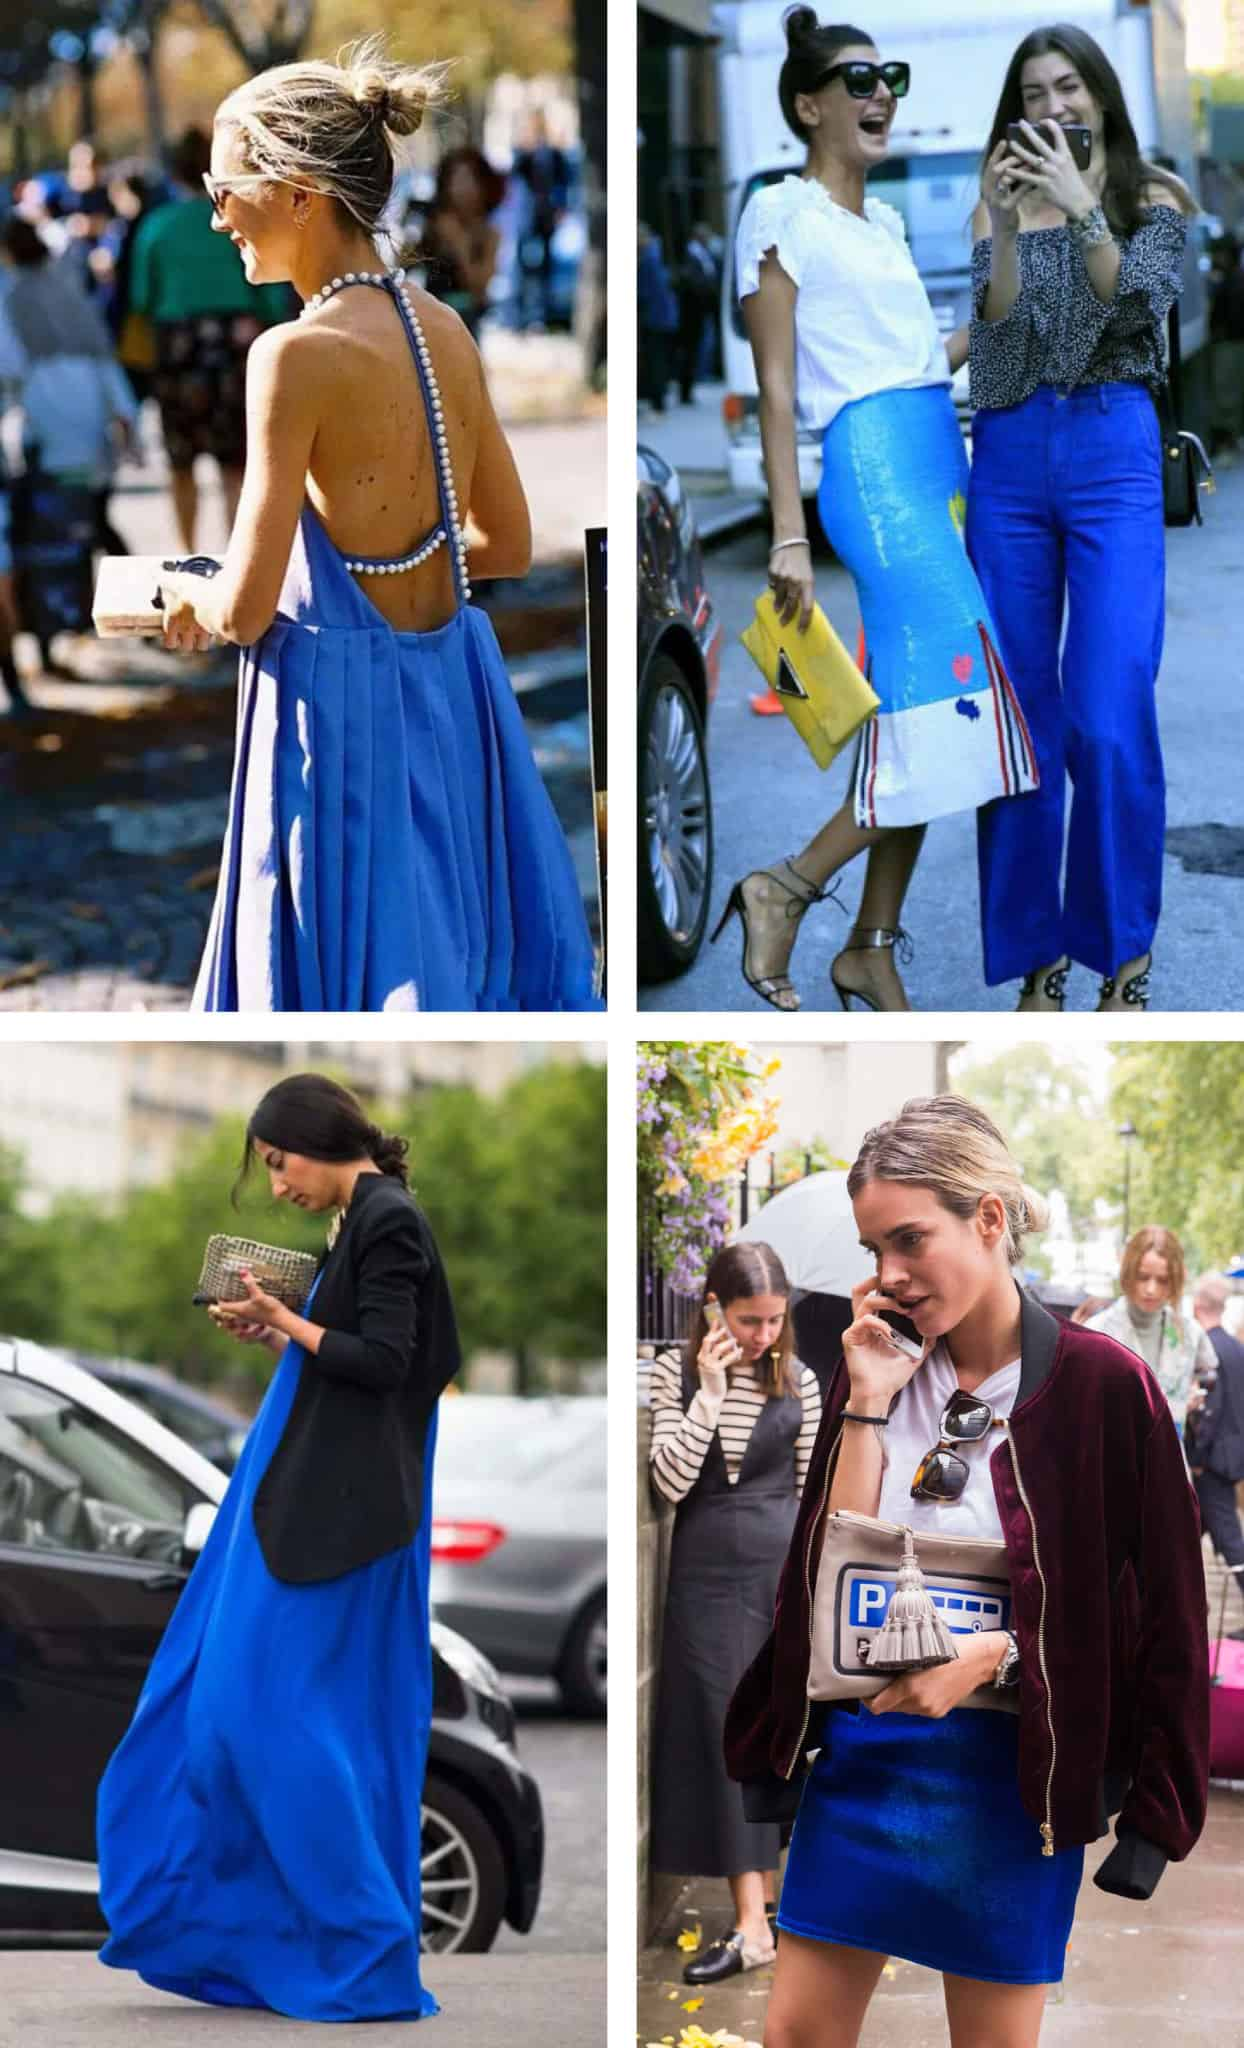 Snorkel_Fashion